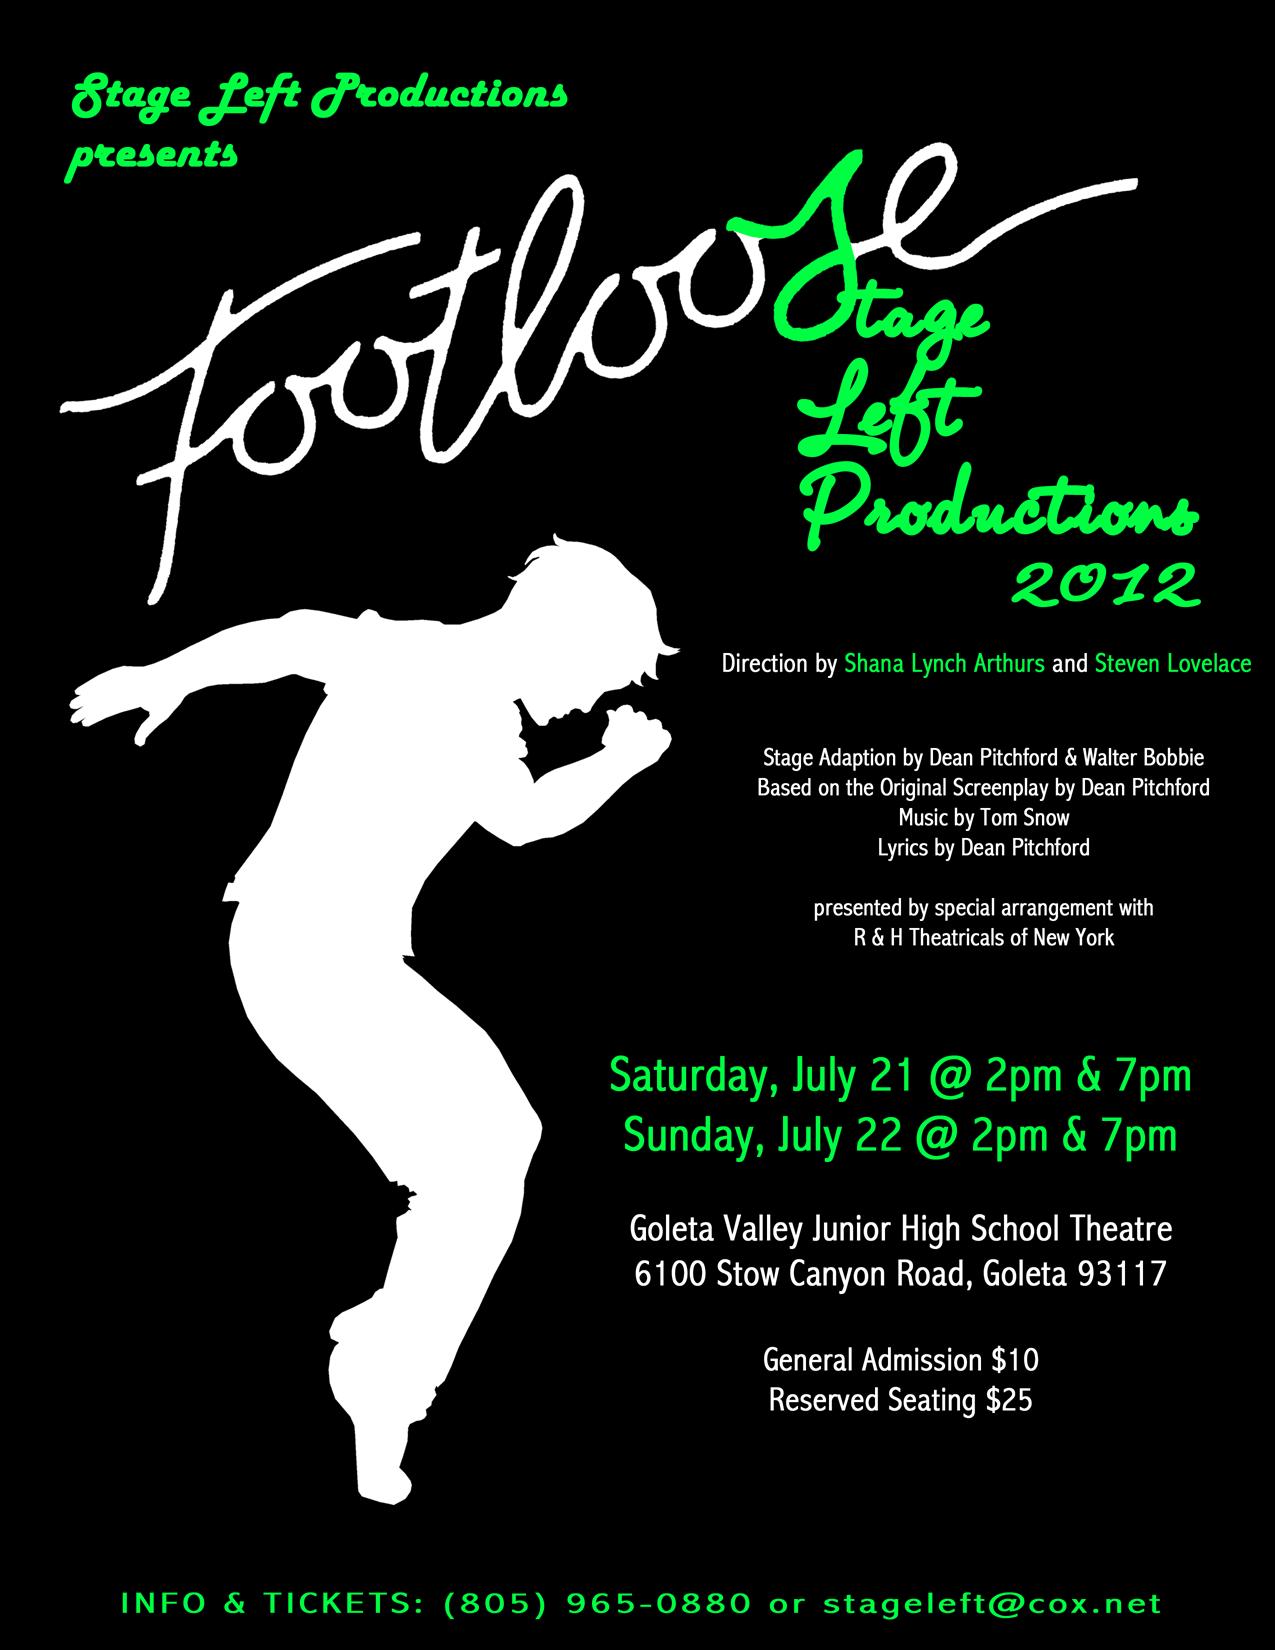 2012 Footloose Poster.png